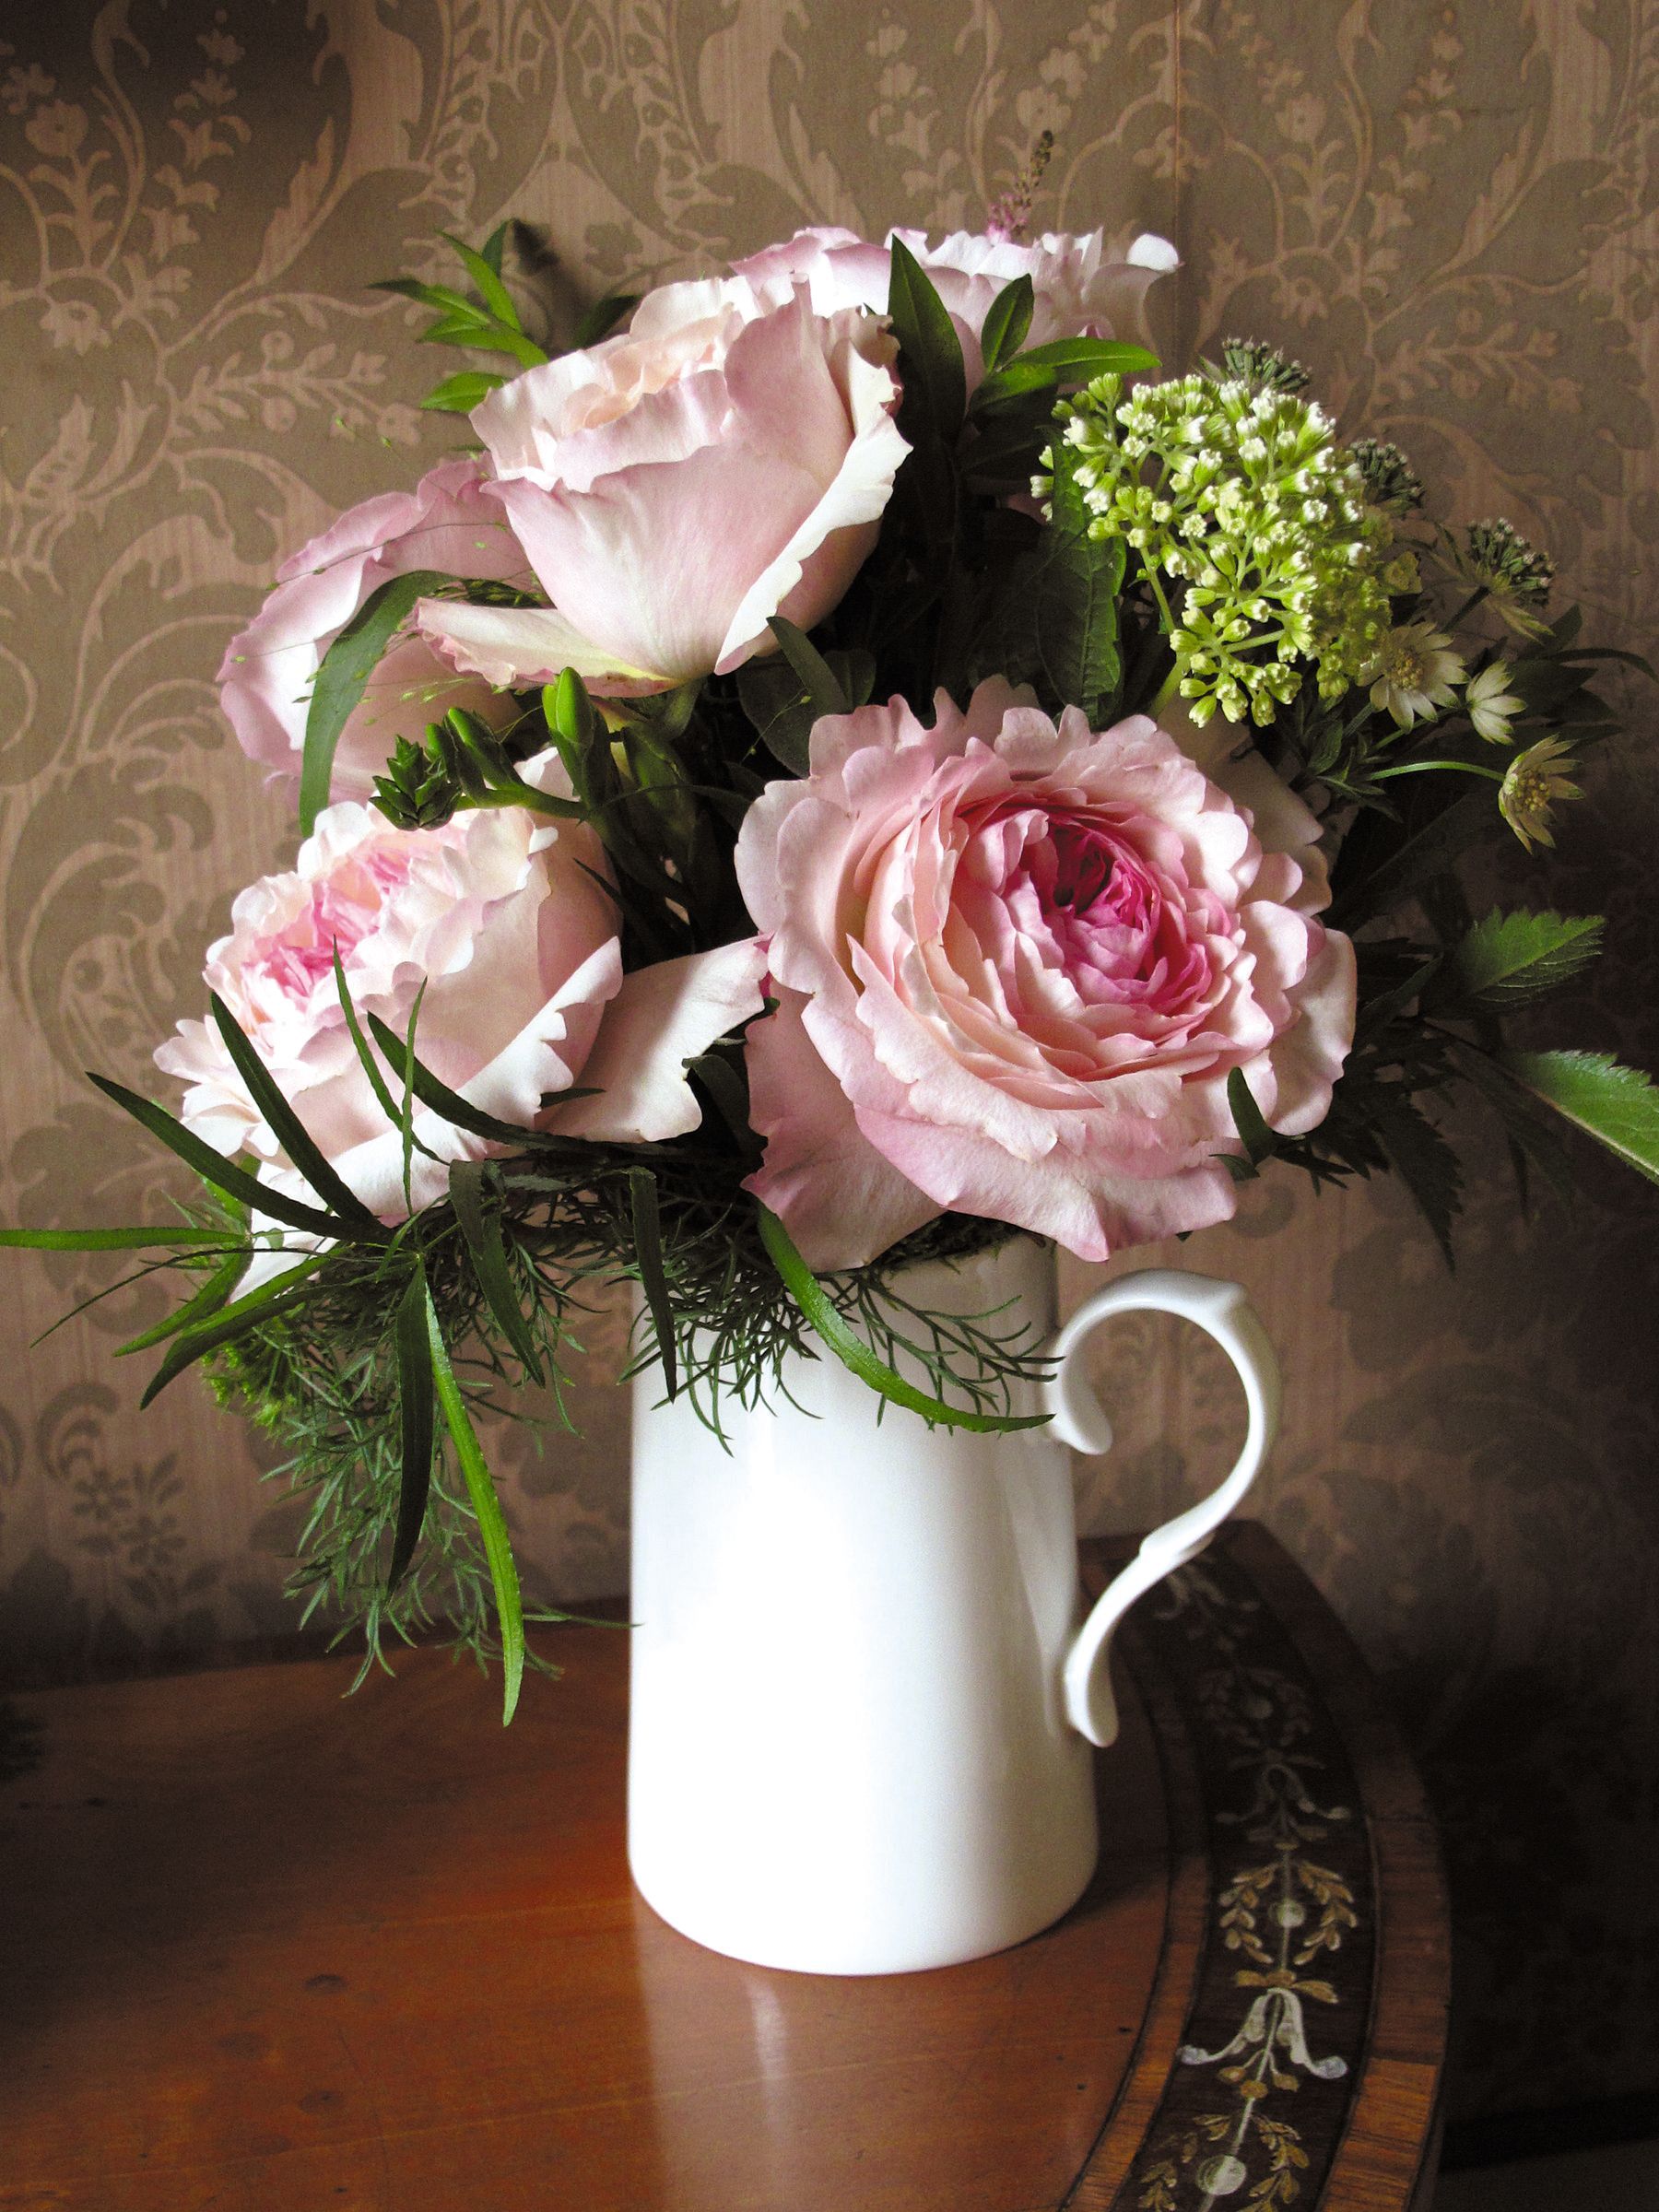 Easter wedding bouquets  Vintage blooms in a pretty jug   de mayo  Pinterest  Vintage